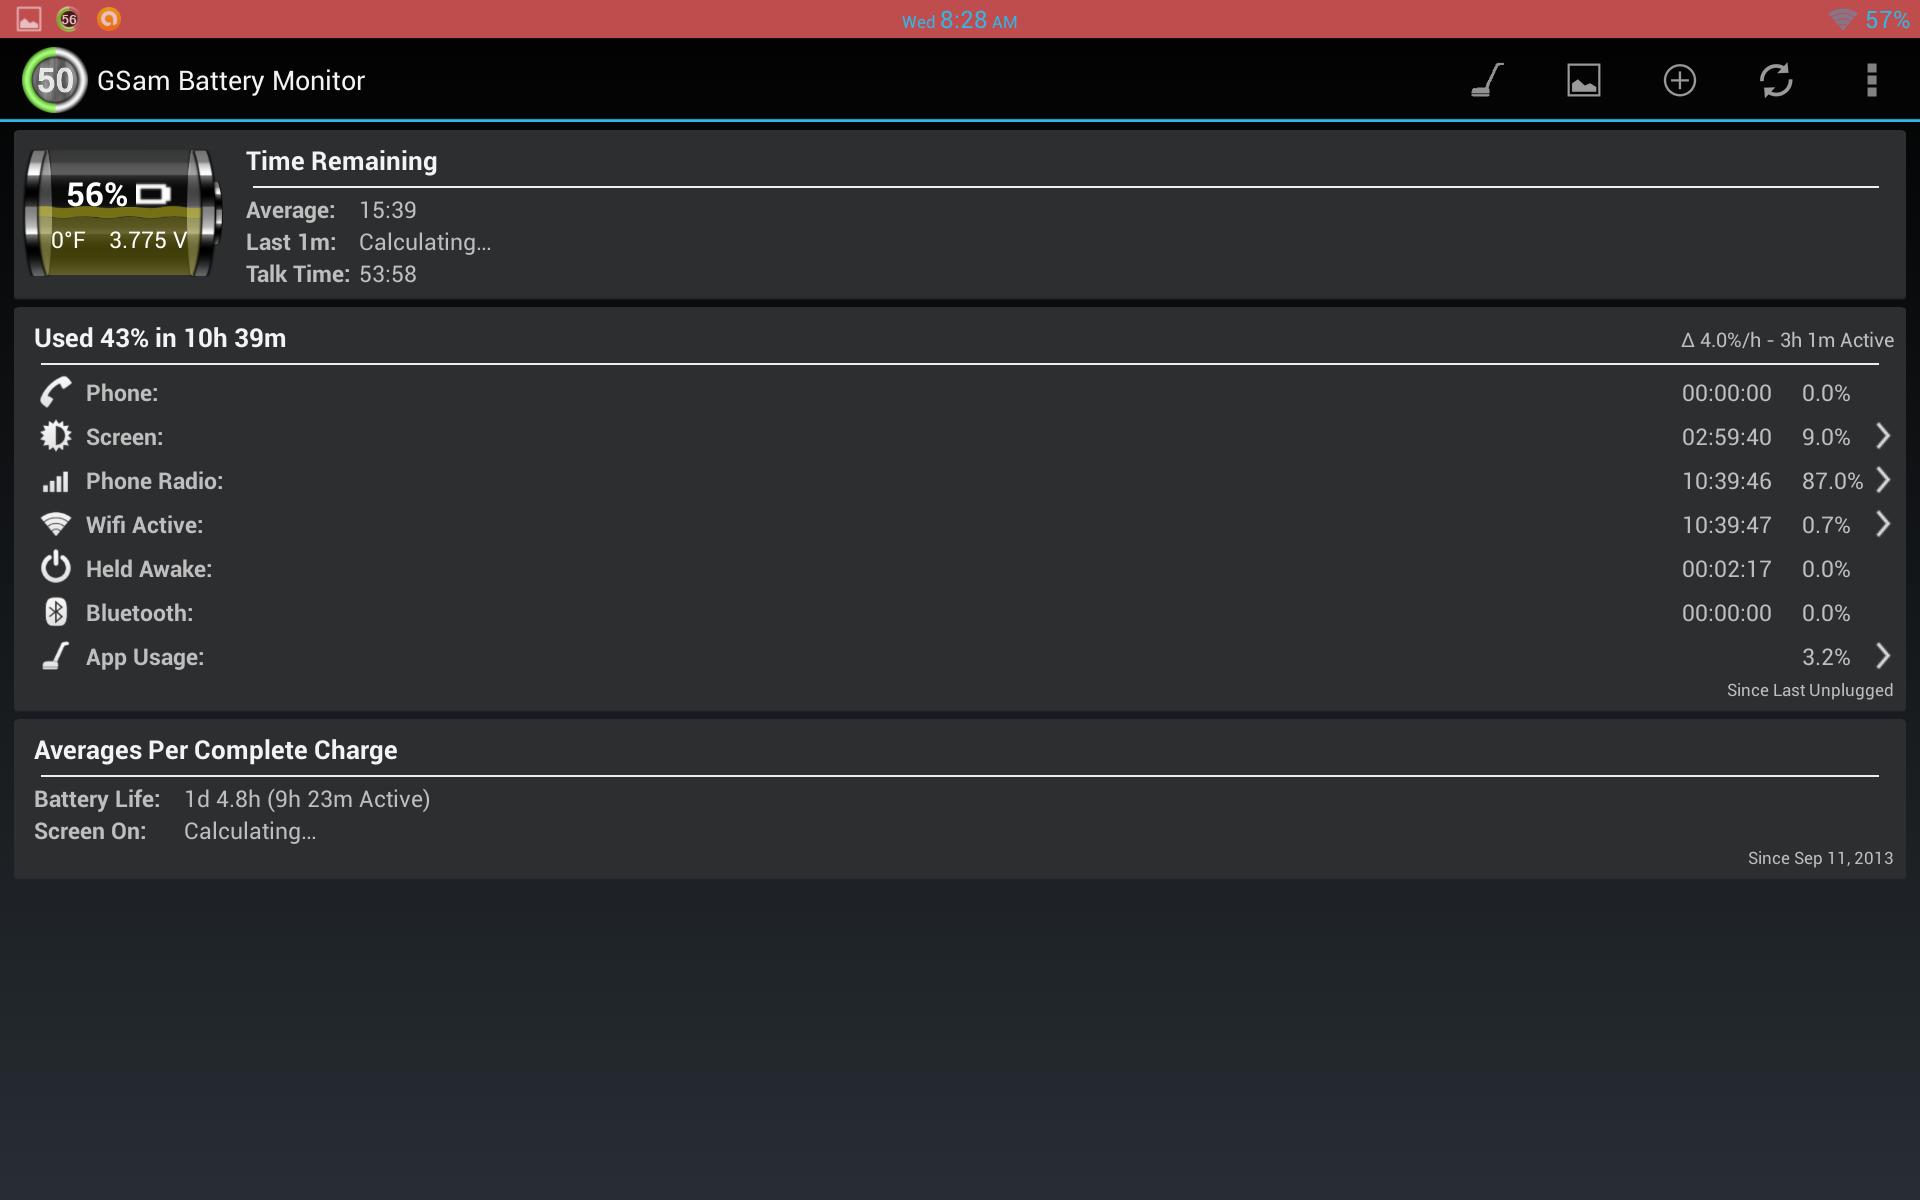 Screenshot_2013-12-04-08-28-58.png